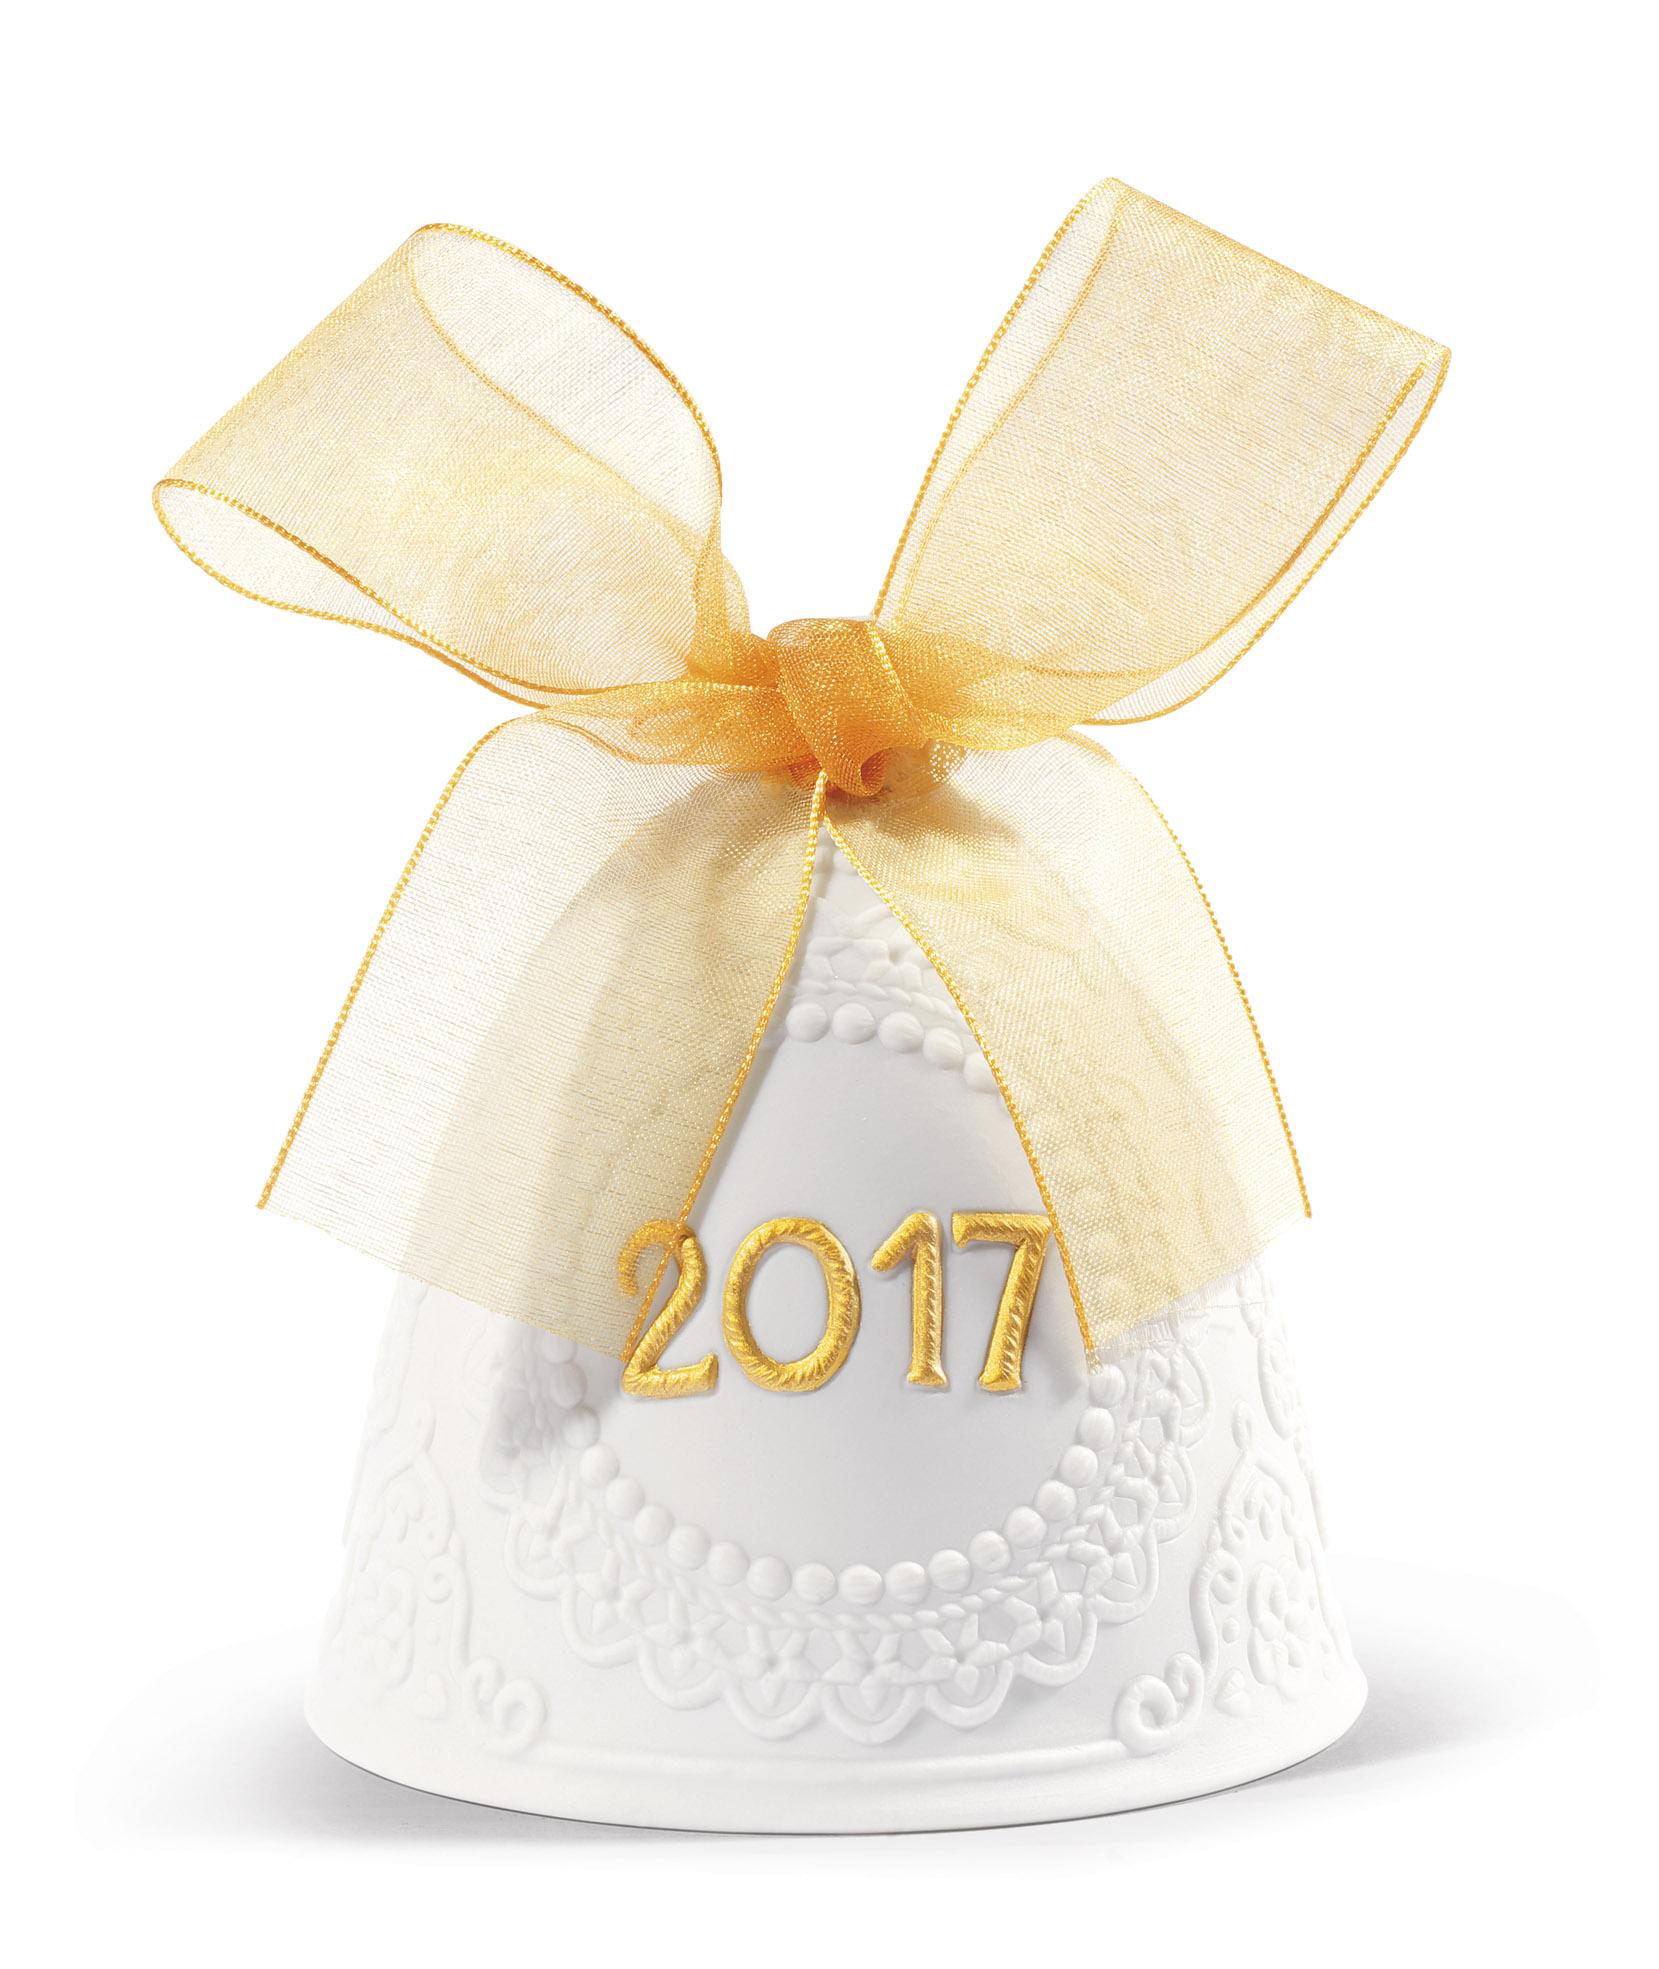 2017 Campana Di Natale (Re-Deco)